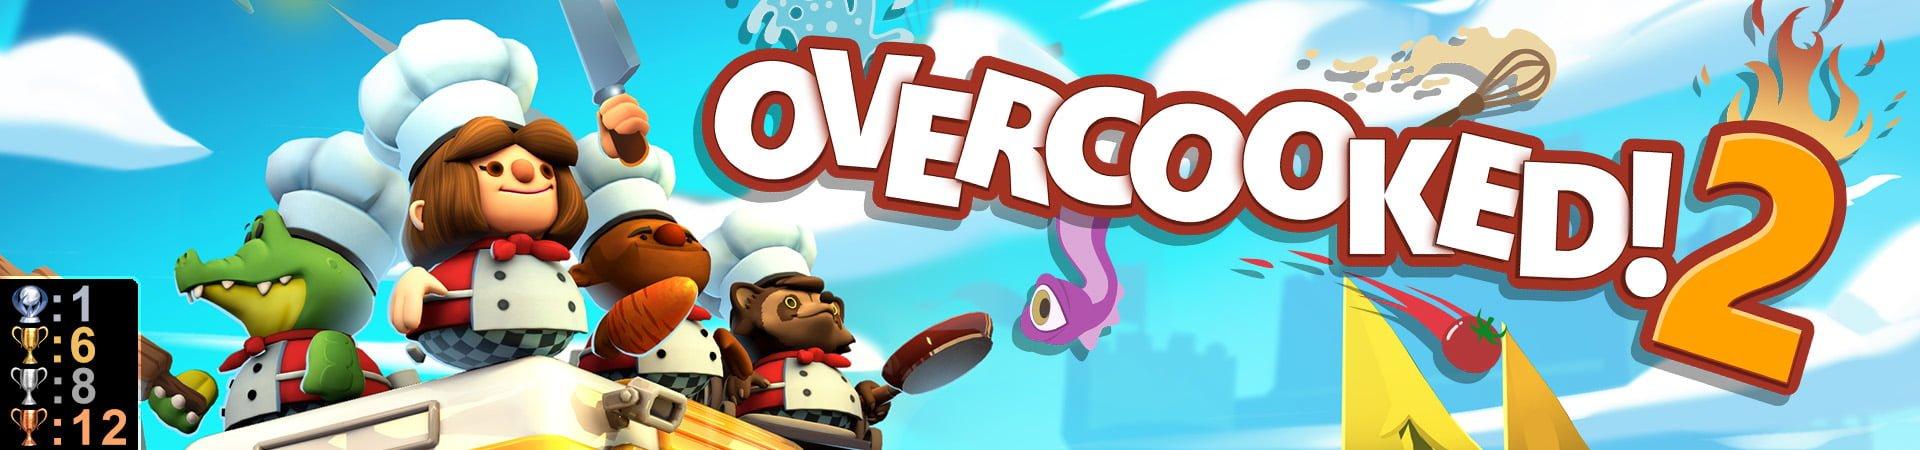 overcooked-2-banner.jpg